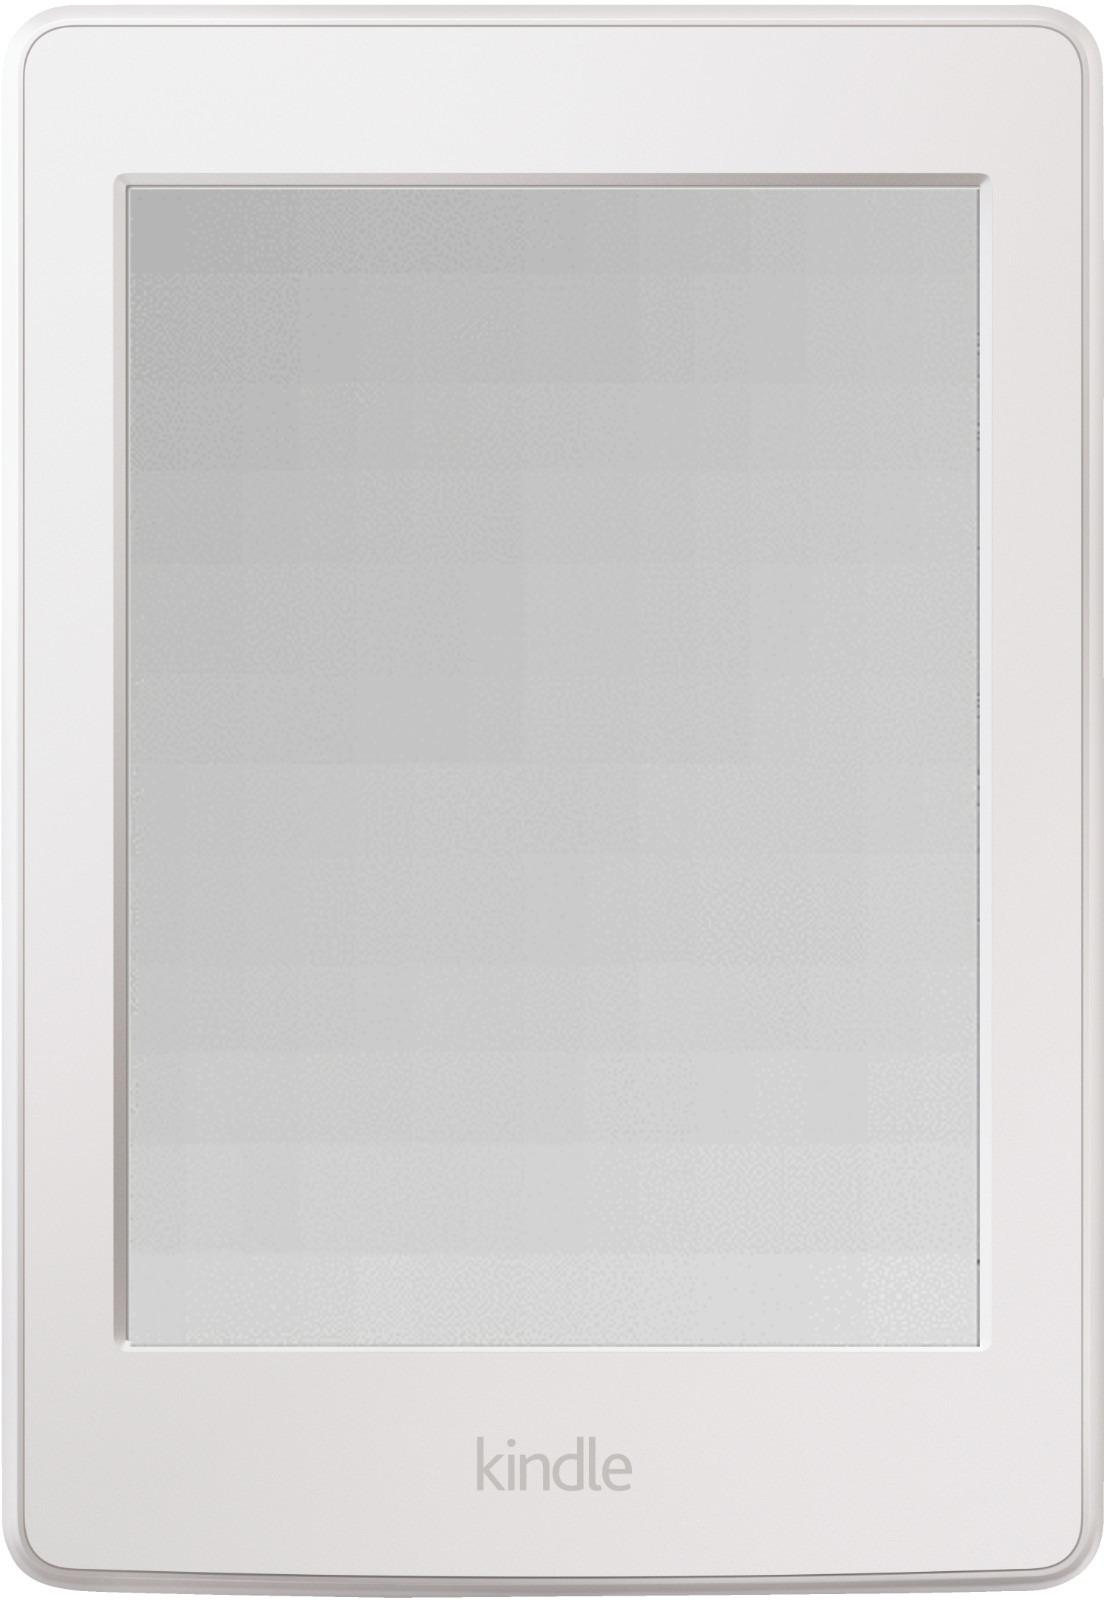 Amazon Kindle Paperwhite 6 4GB [Wi-Fi + 3G, 3. Generation] weiß